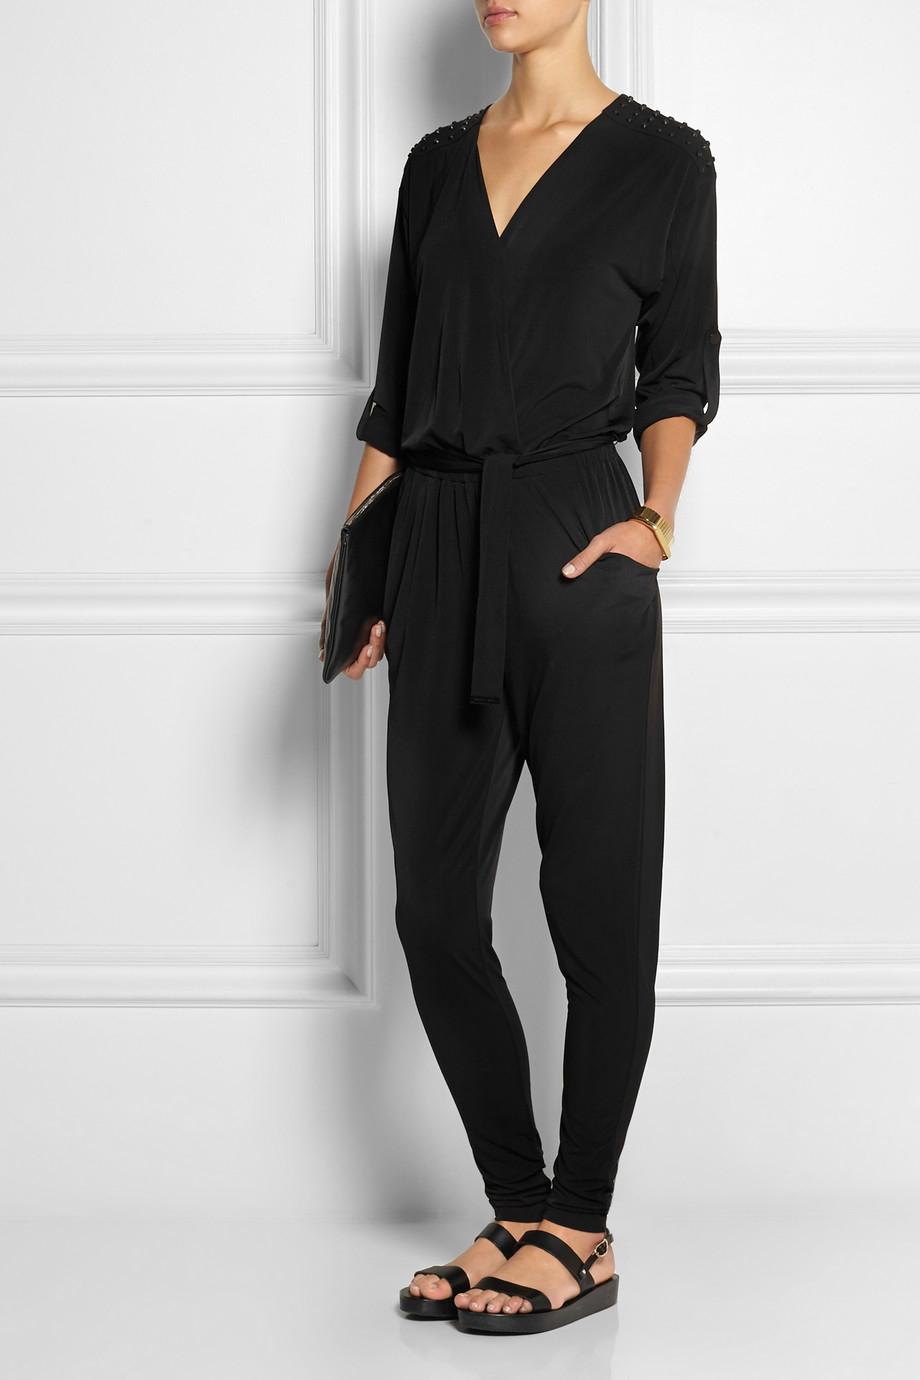 lyst michael michael kors studded stretch jersey jumpsuit in black. Black Bedroom Furniture Sets. Home Design Ideas